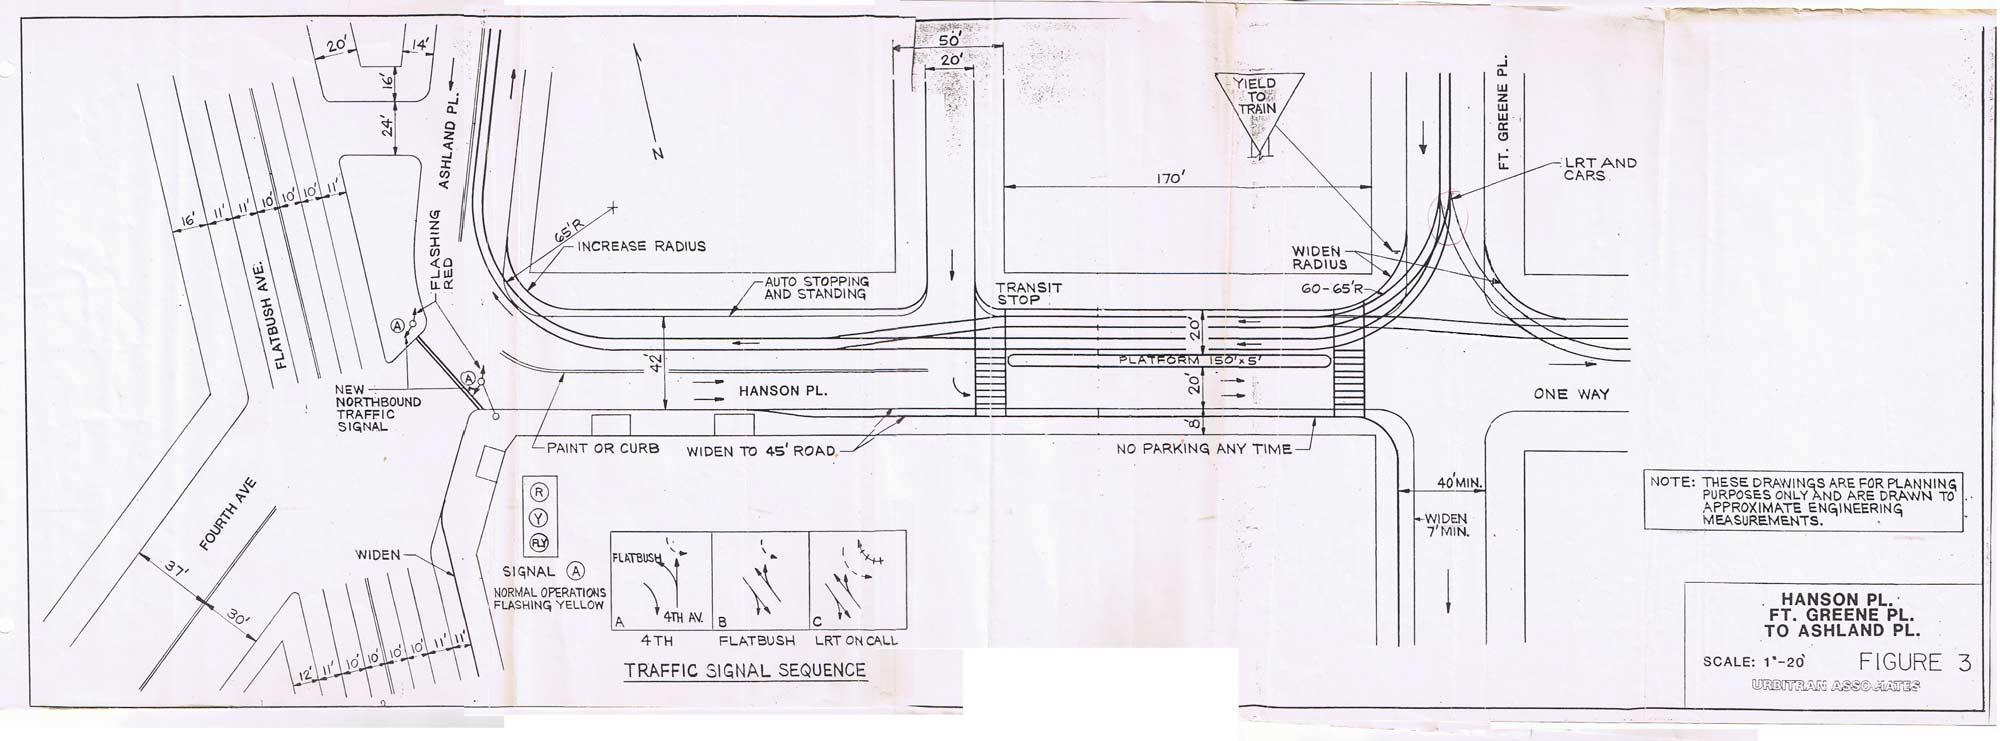 BHRA: The New Brooklyn Streetcar Plan